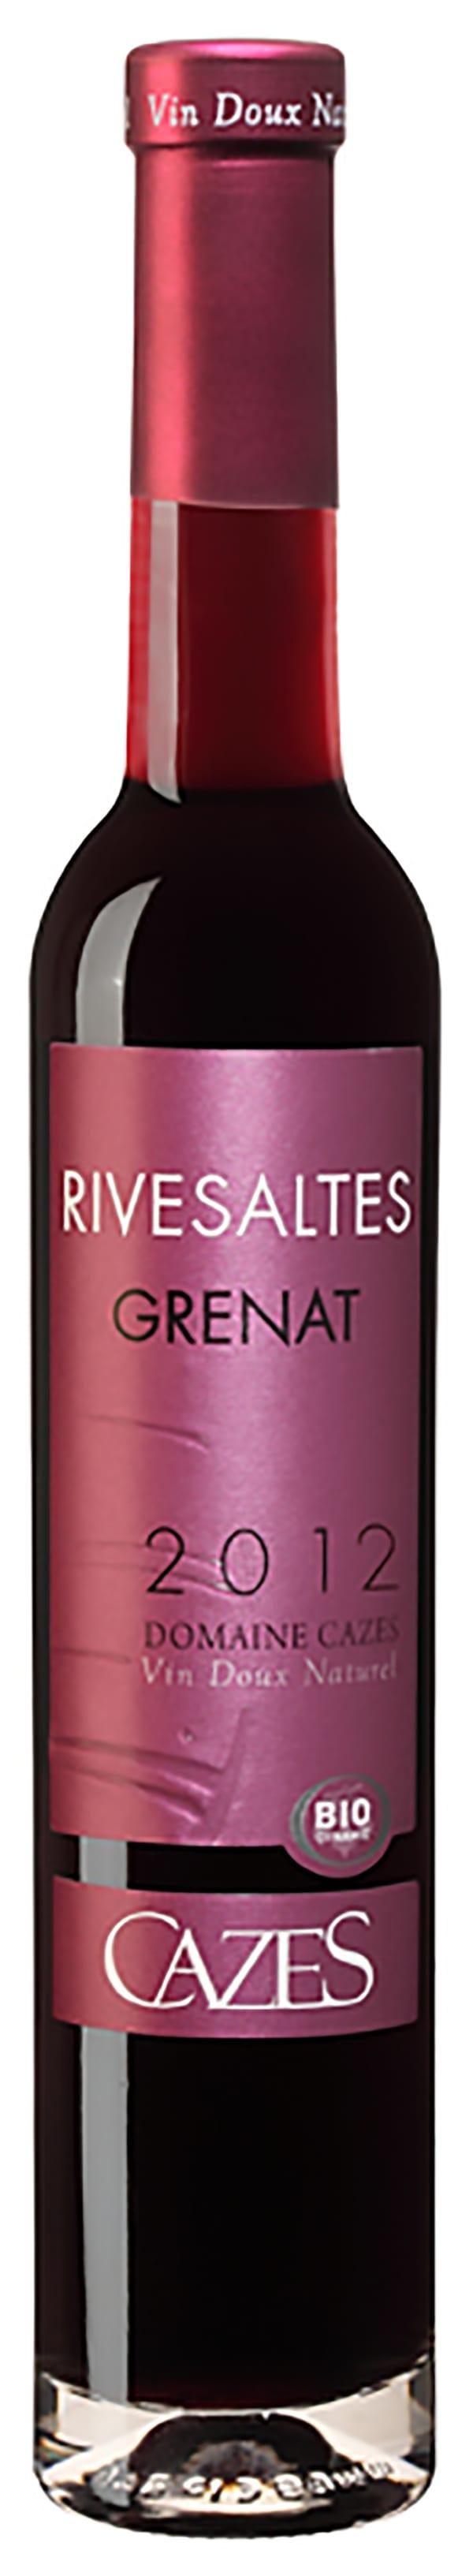 Cazes Rivesaltes Grenat 2011